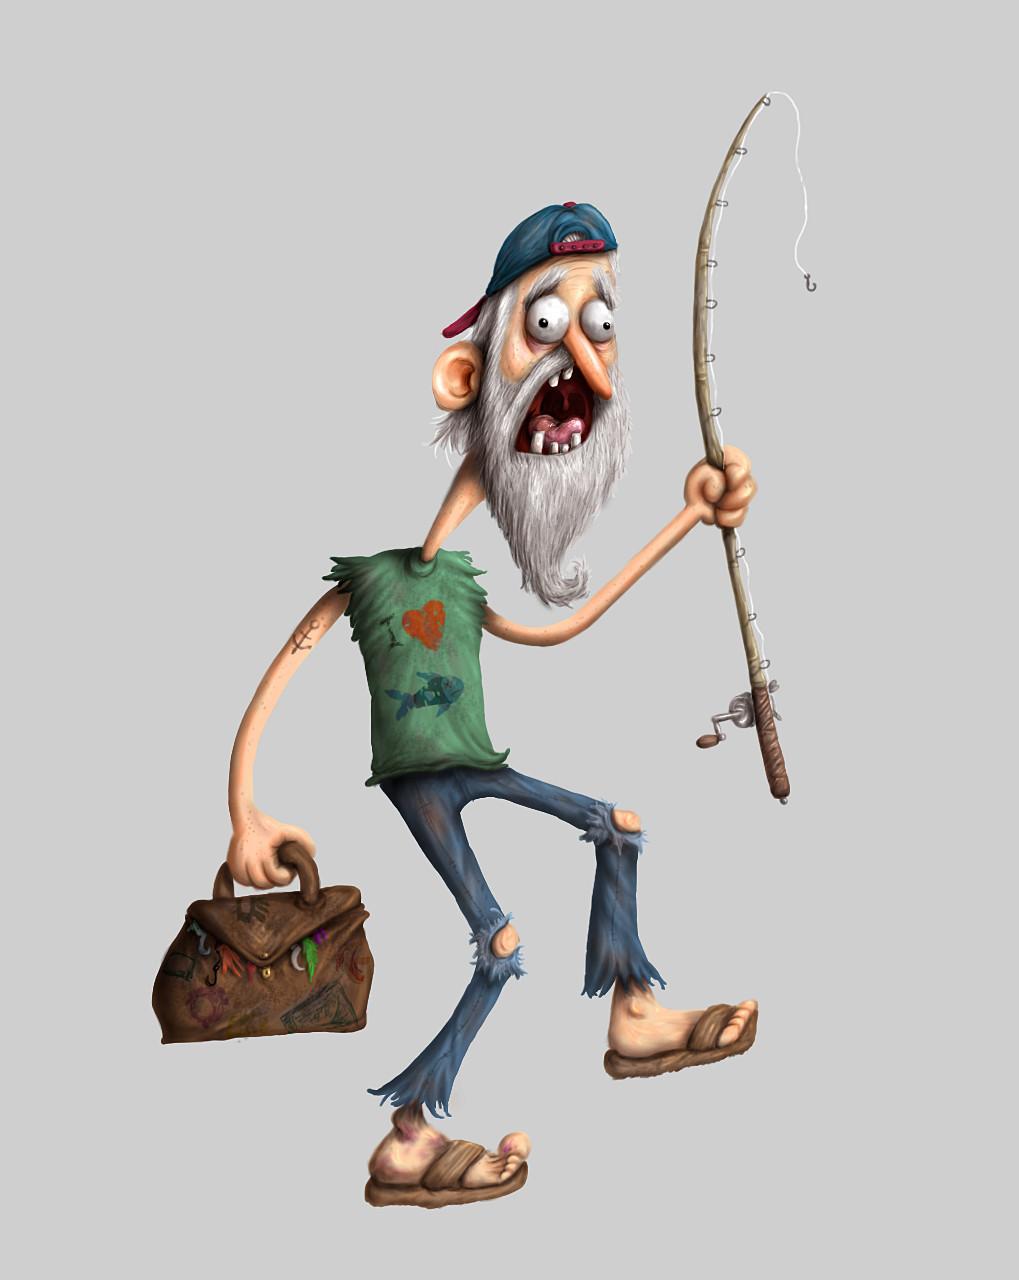 https://cdna.artstation.com/p/assets/images/images/009/218/512/large/arnaldo-souza-leonardo-badanais-fisherman.jpg?1517771985